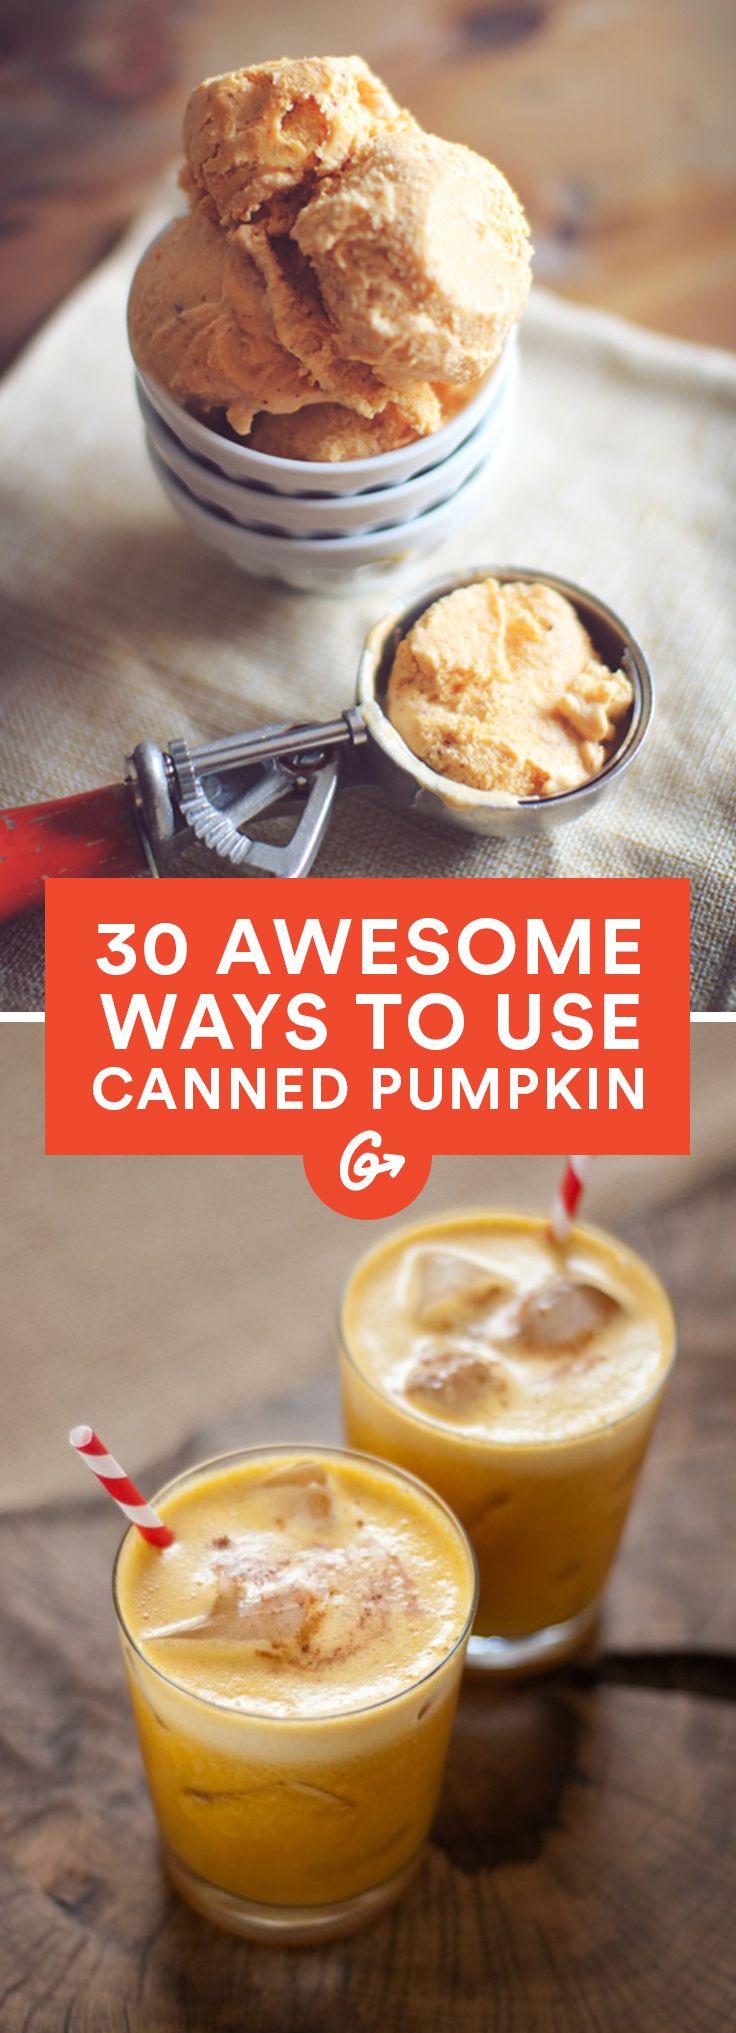 Healthy Canned Pumpkin Dessert Recipes  100 Canned Pumpkin Recipes on Pinterest